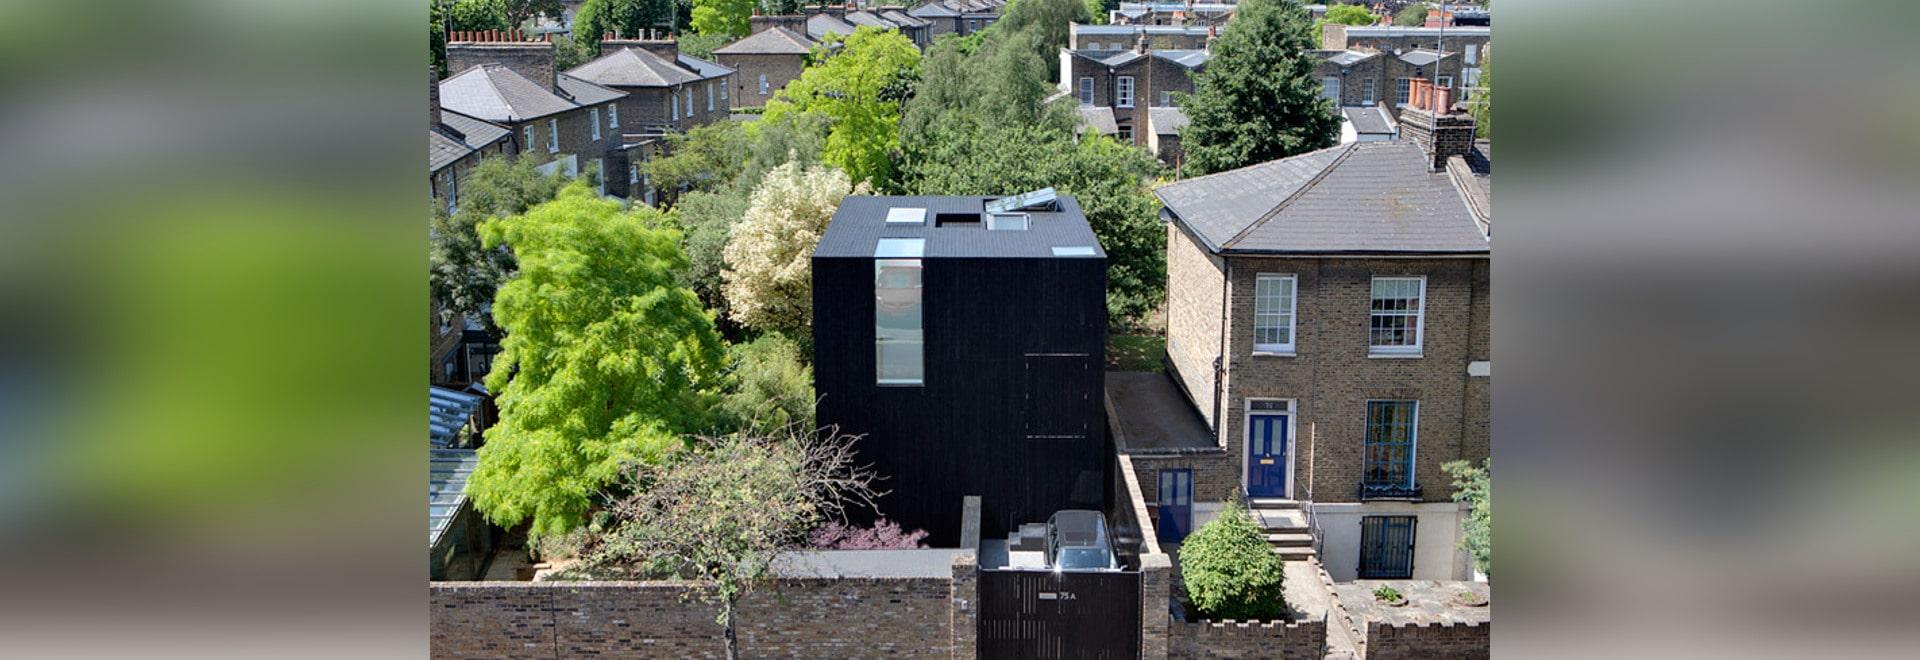 Private CrossRail station planned underneath Adjaye-designed London house